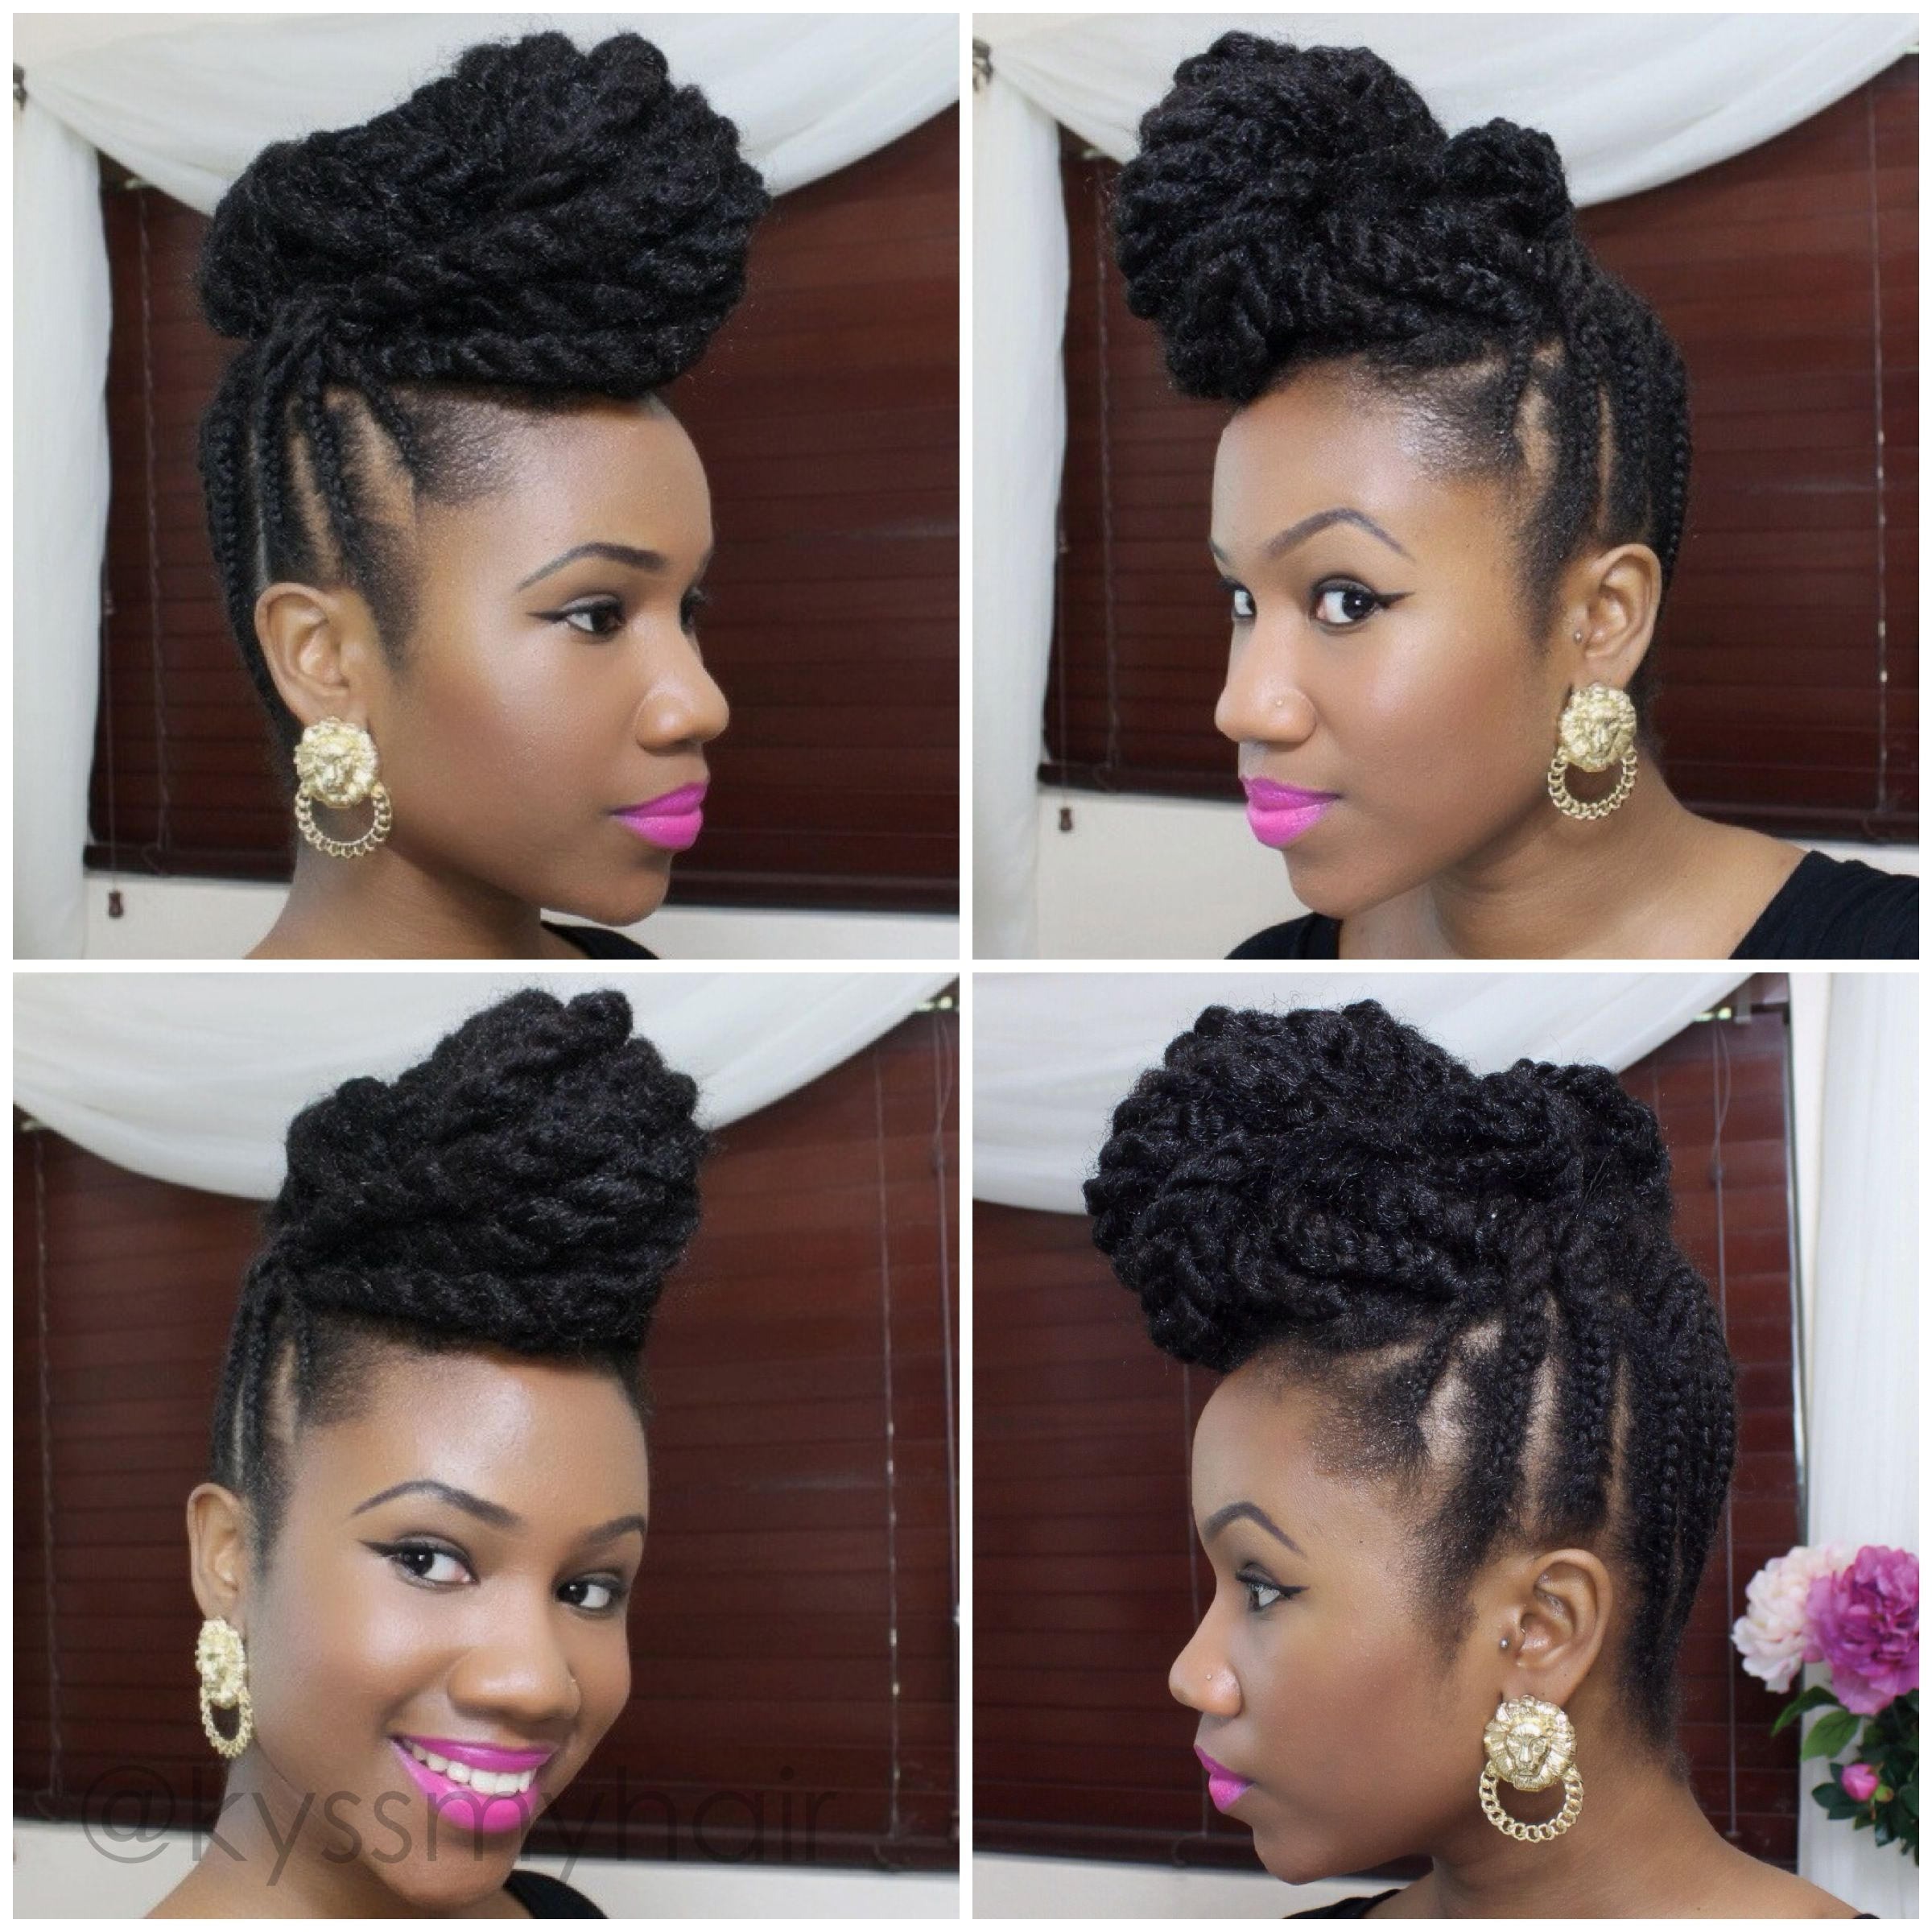 Pleasant 1000 Images About Hair Styles On Pinterest Havana Twists Short Hairstyles Gunalazisus